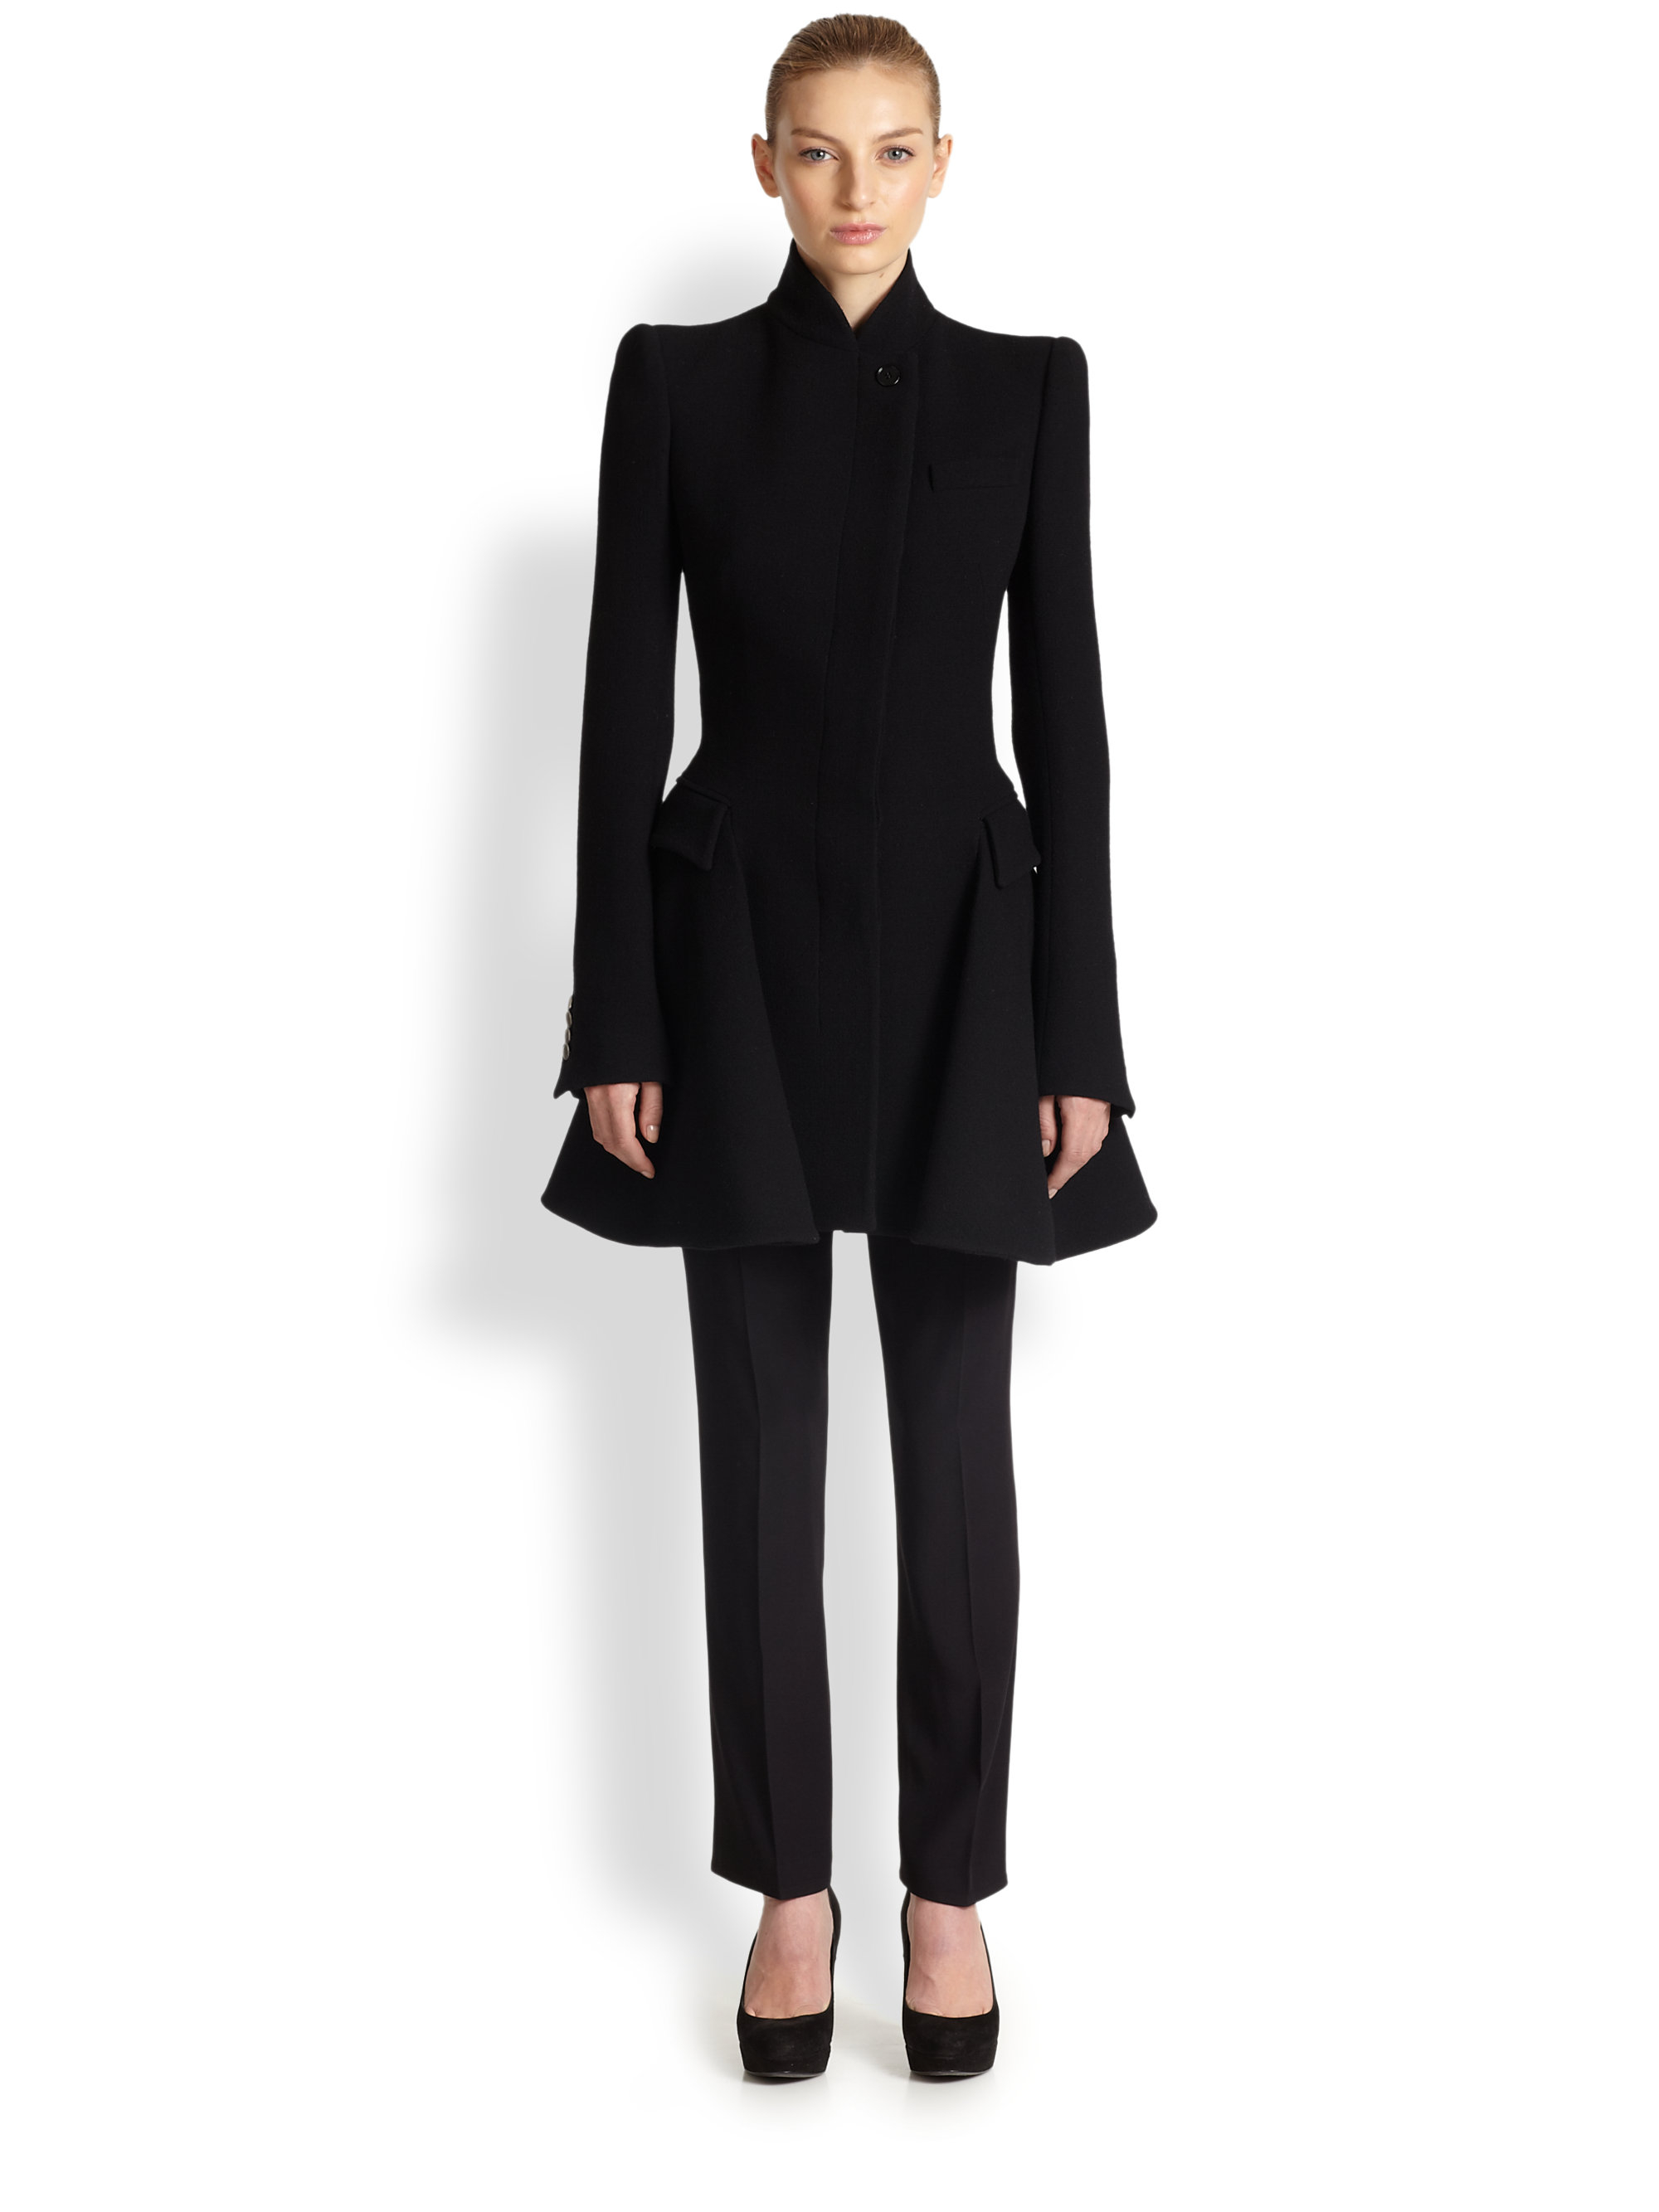 Alexander Mcqueen Wool Coat Dress In Black Lyst